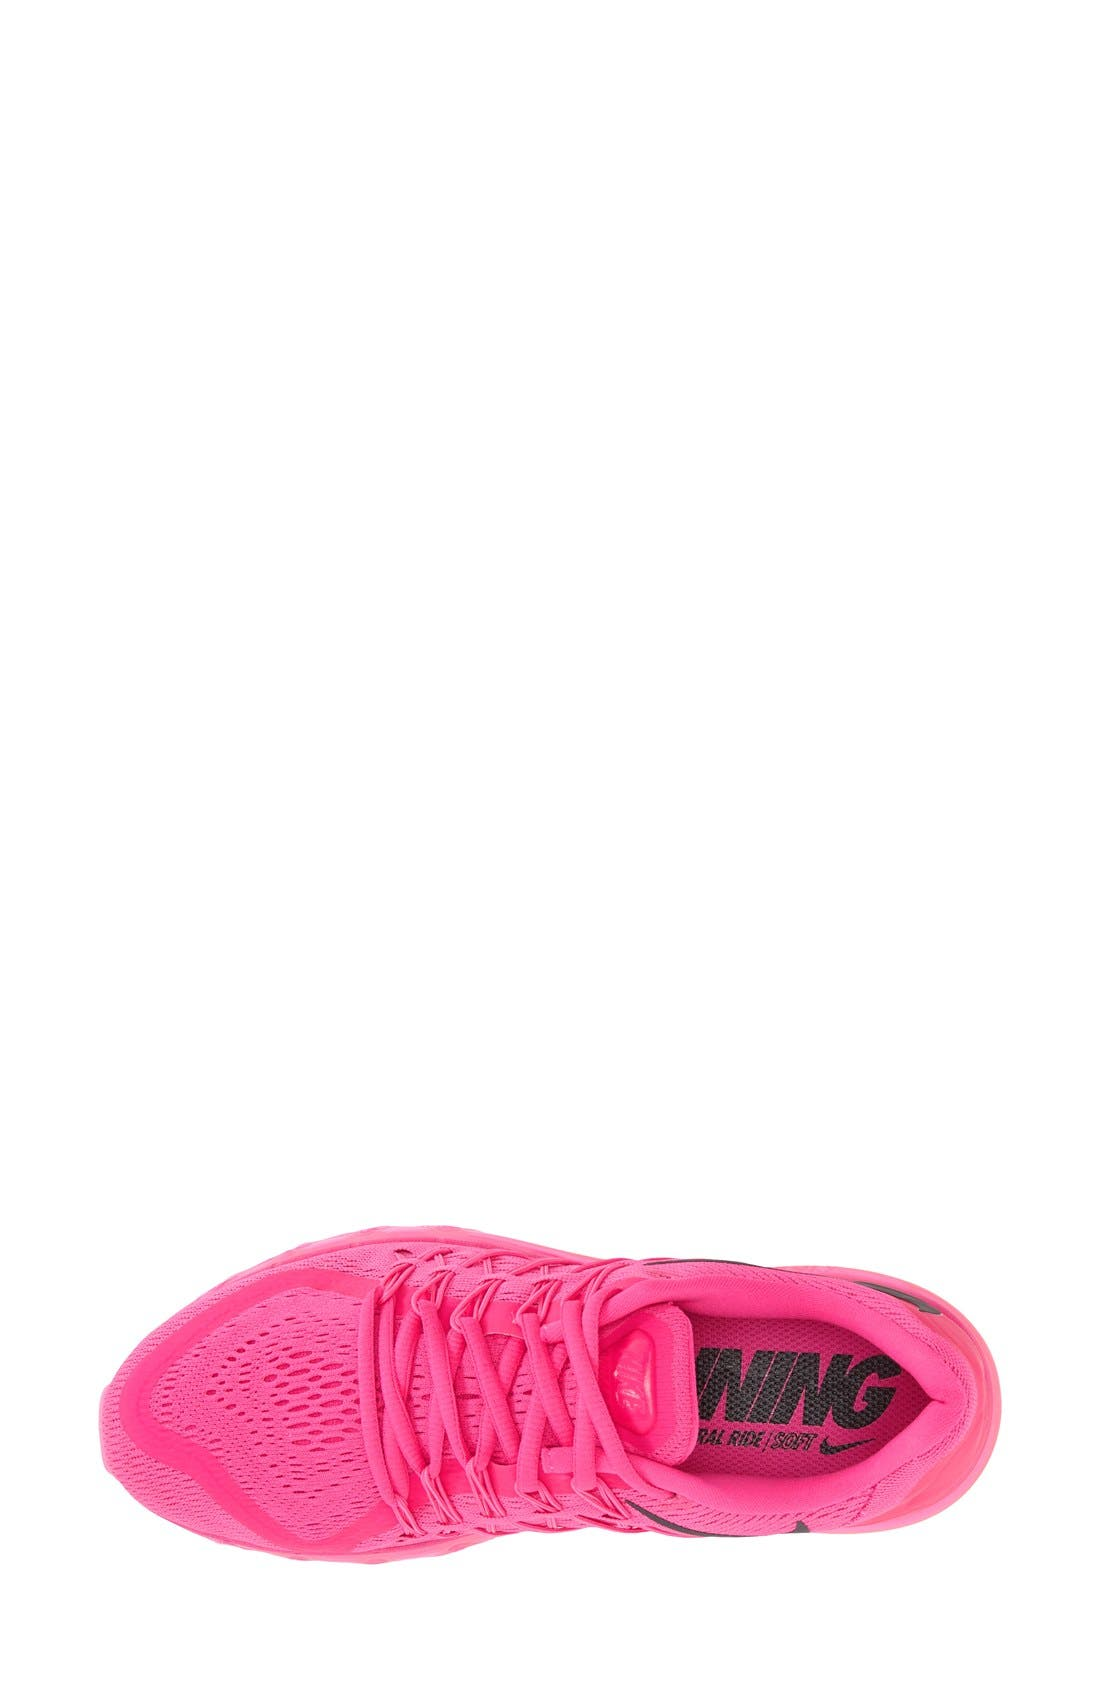 Alternate Image 3  - Nike 'Air Max 15' Running Shoe (Women)